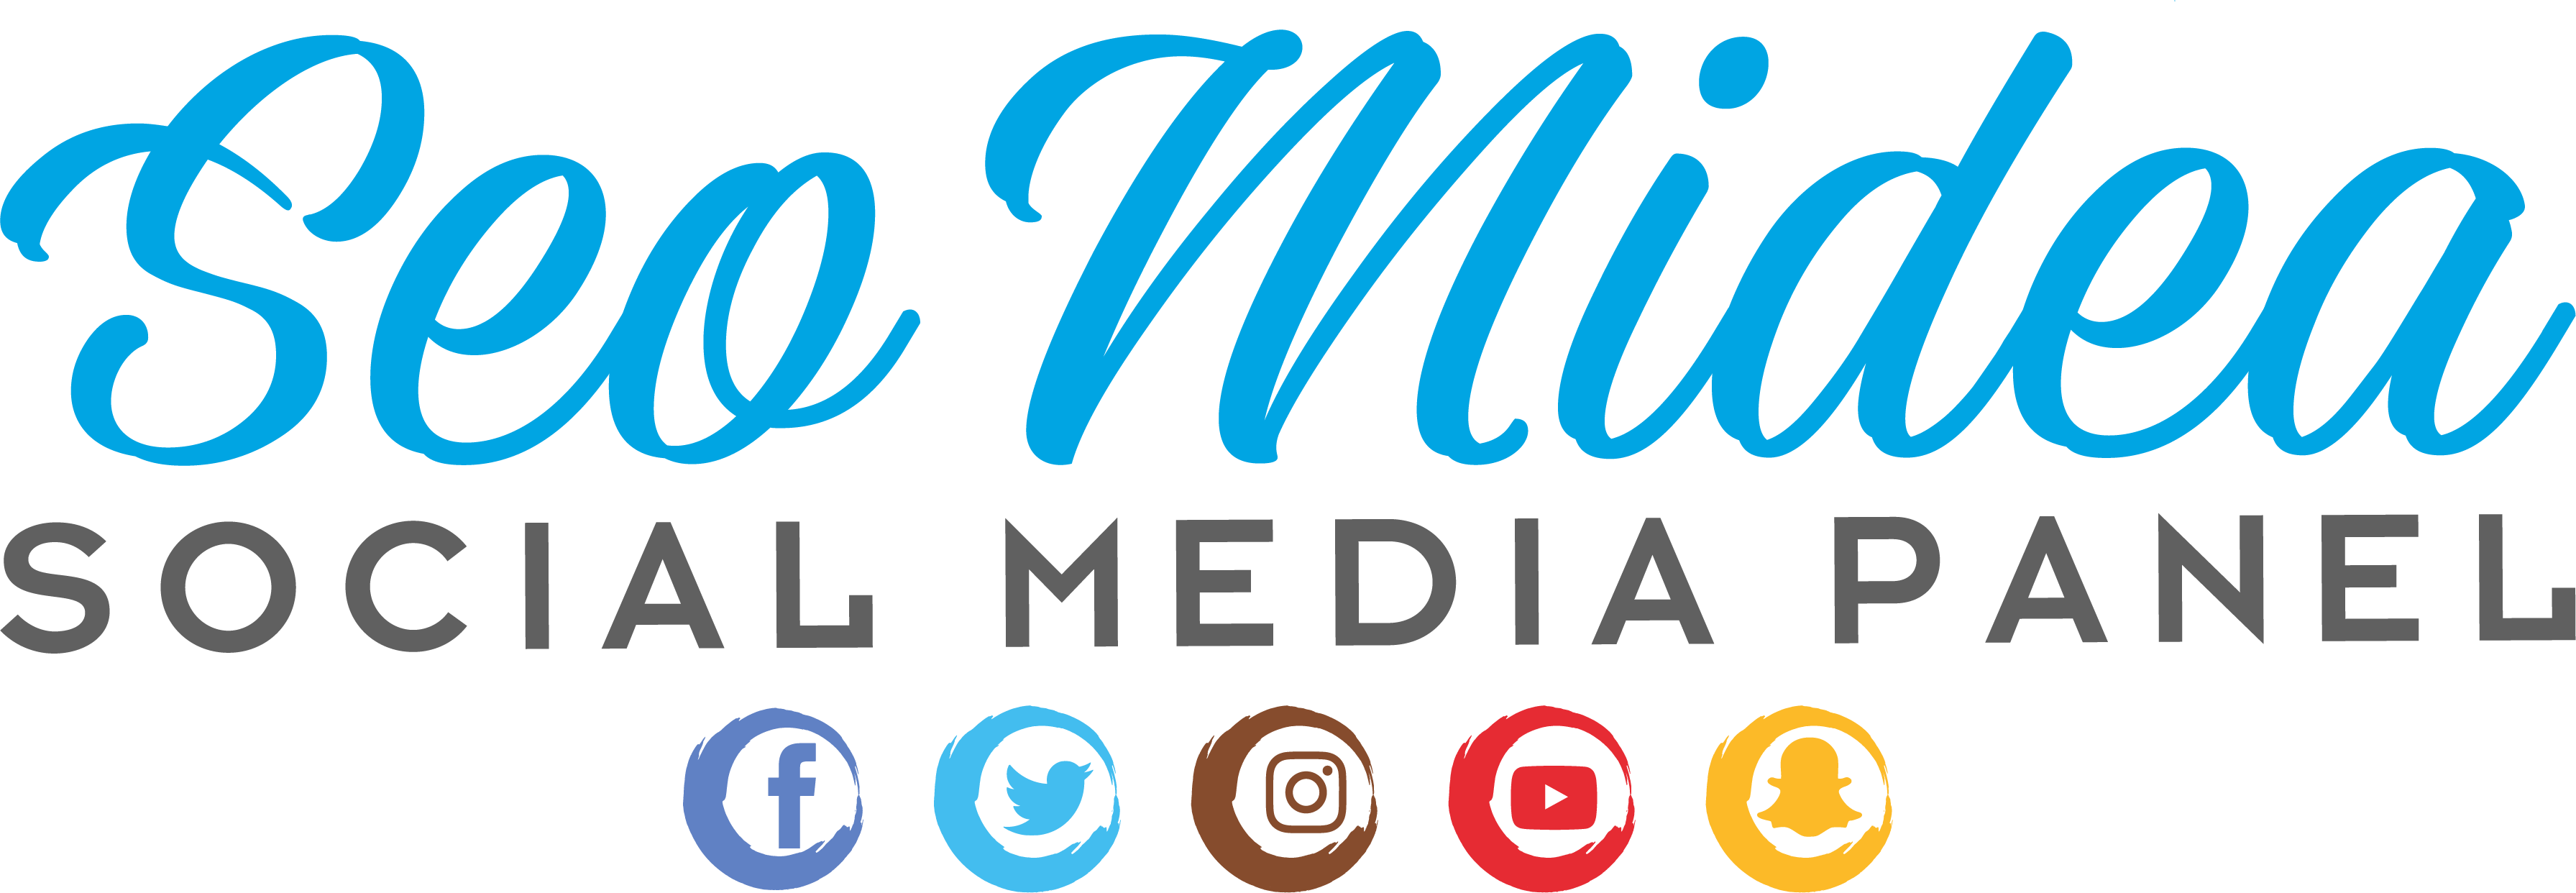 seomidea| Social Media Service Provider